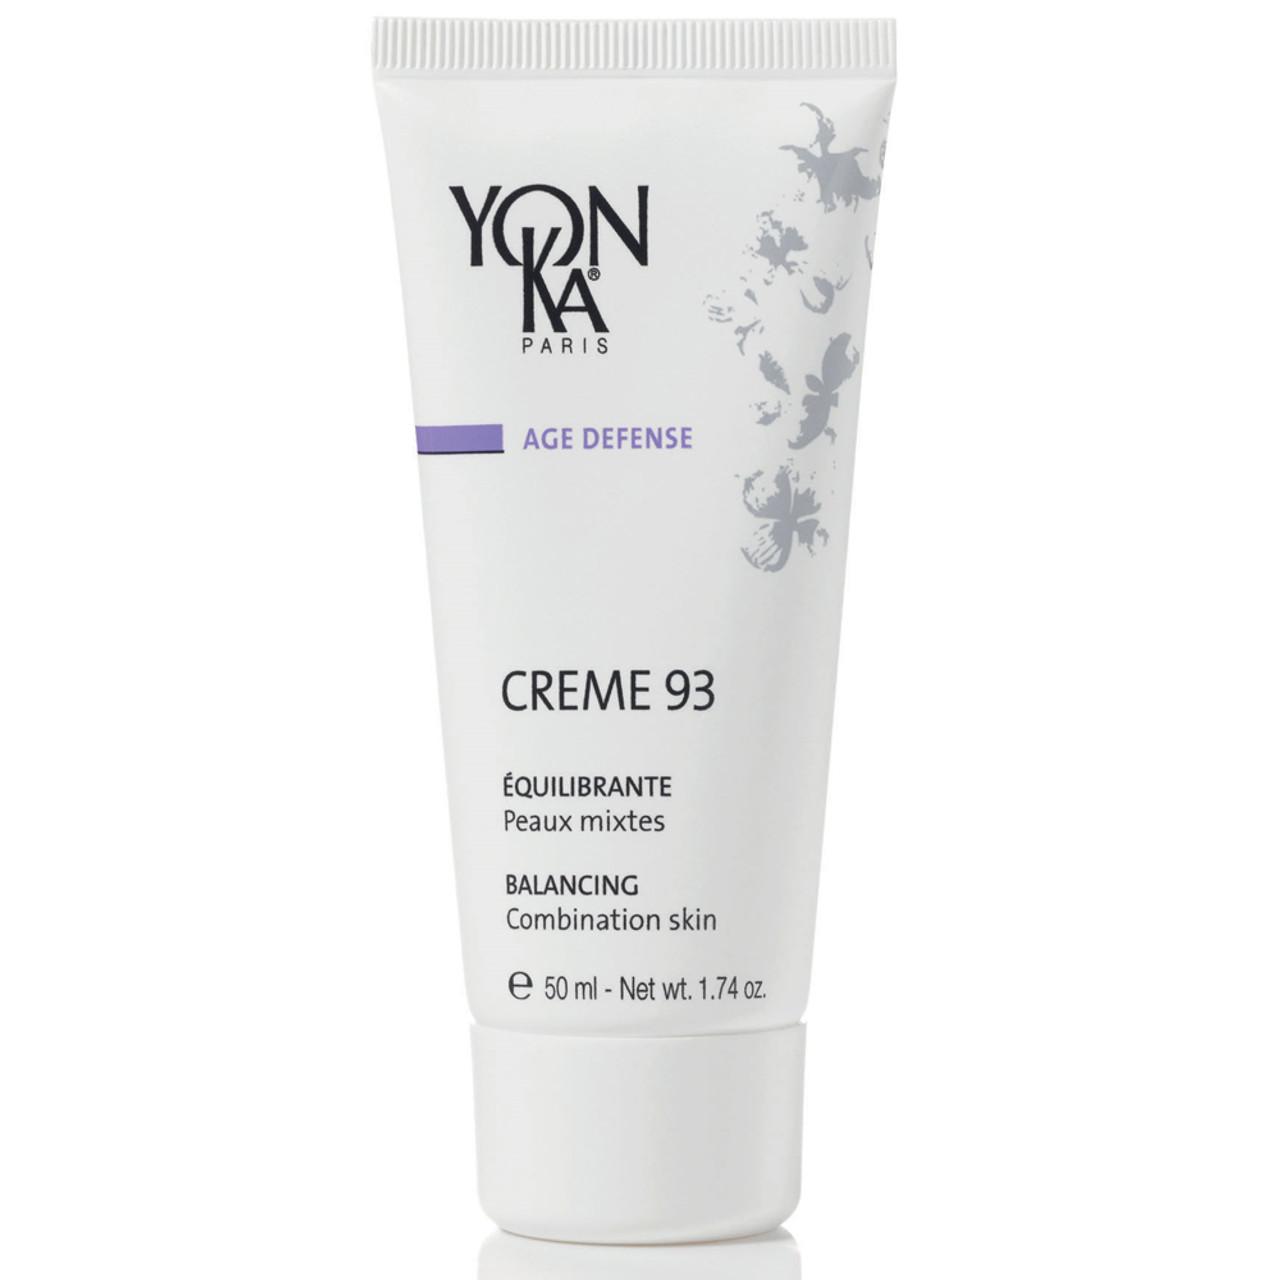 YonKa Creme 93 Balancing Cream BeautifiedYou.com